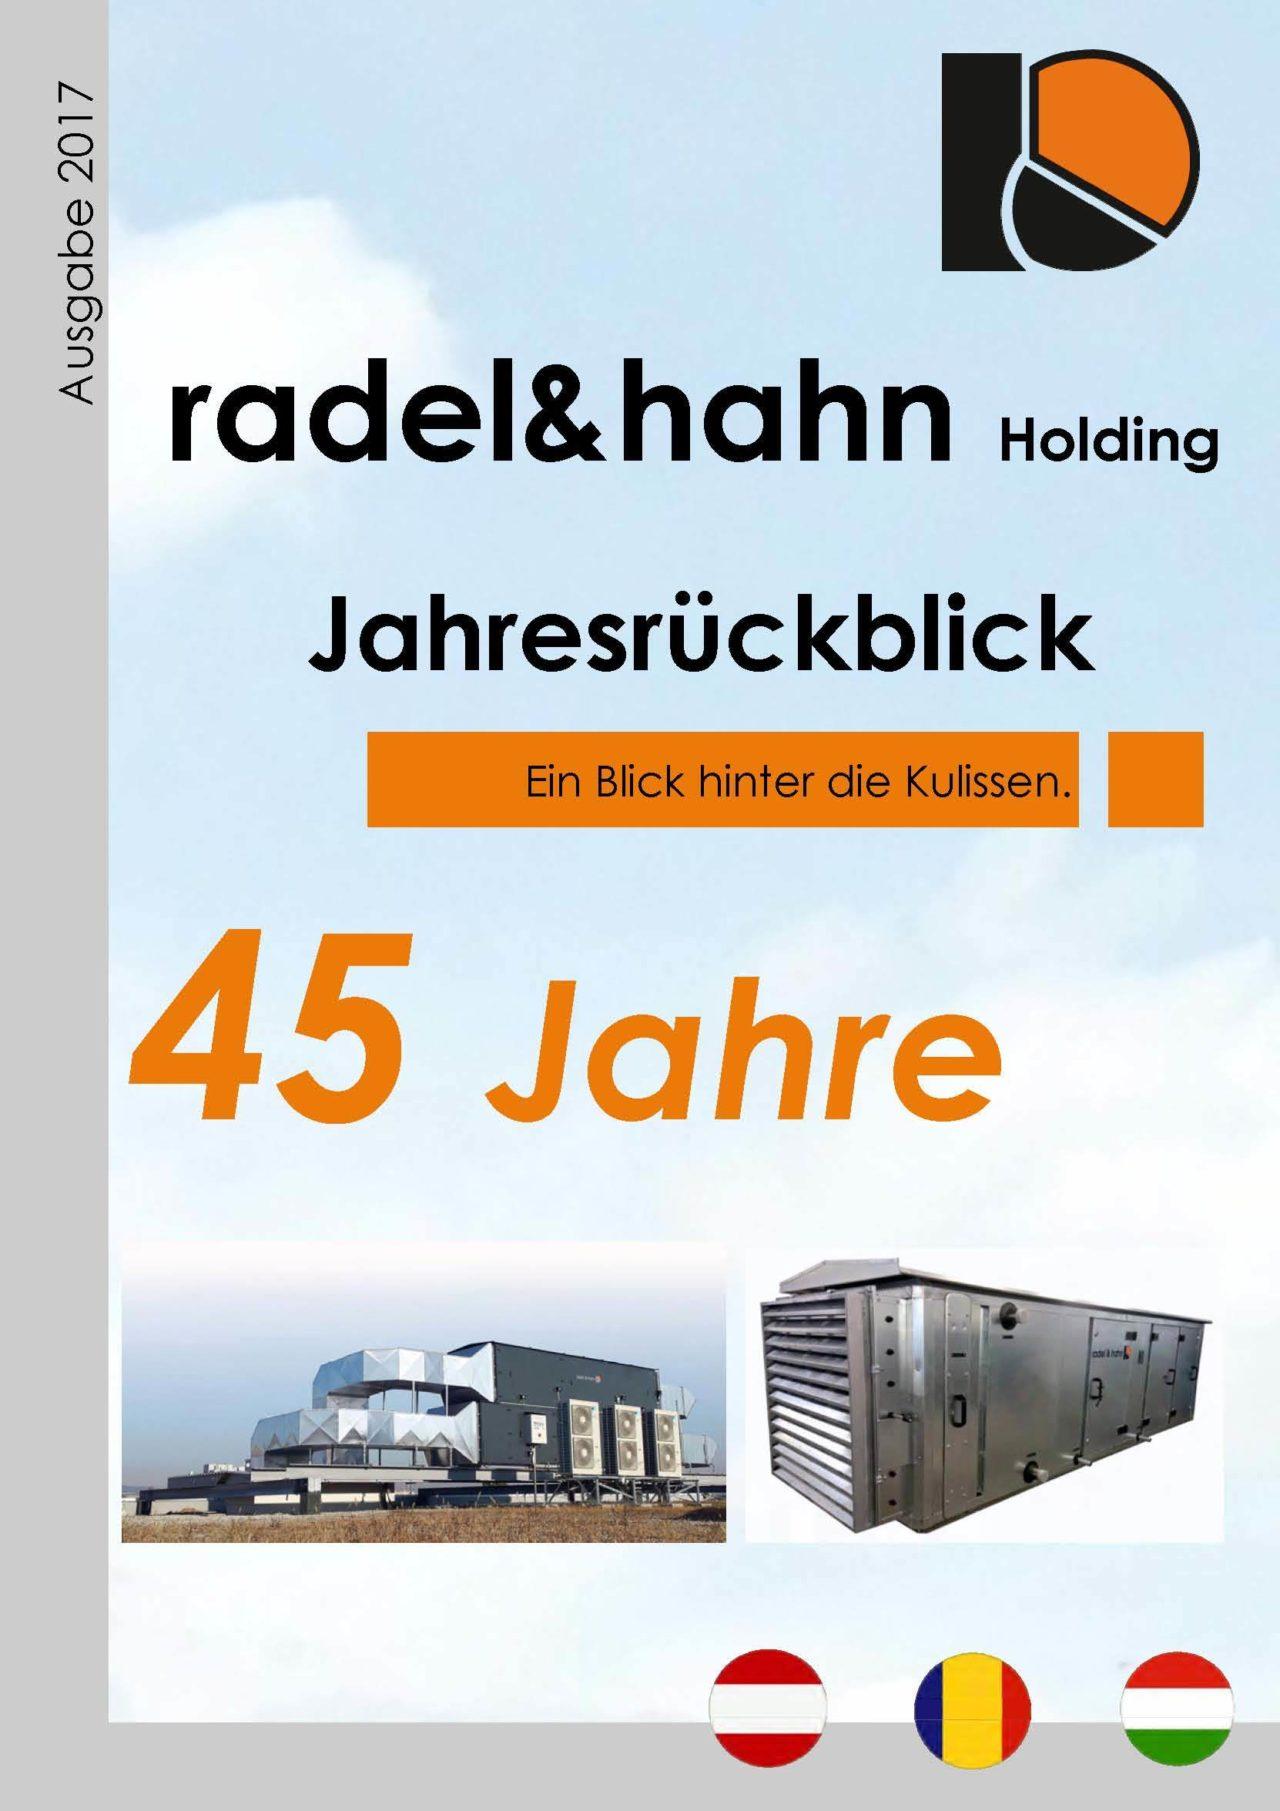 radel&hahn Holding Jahresruckblick 2017 | Blog - Microwell